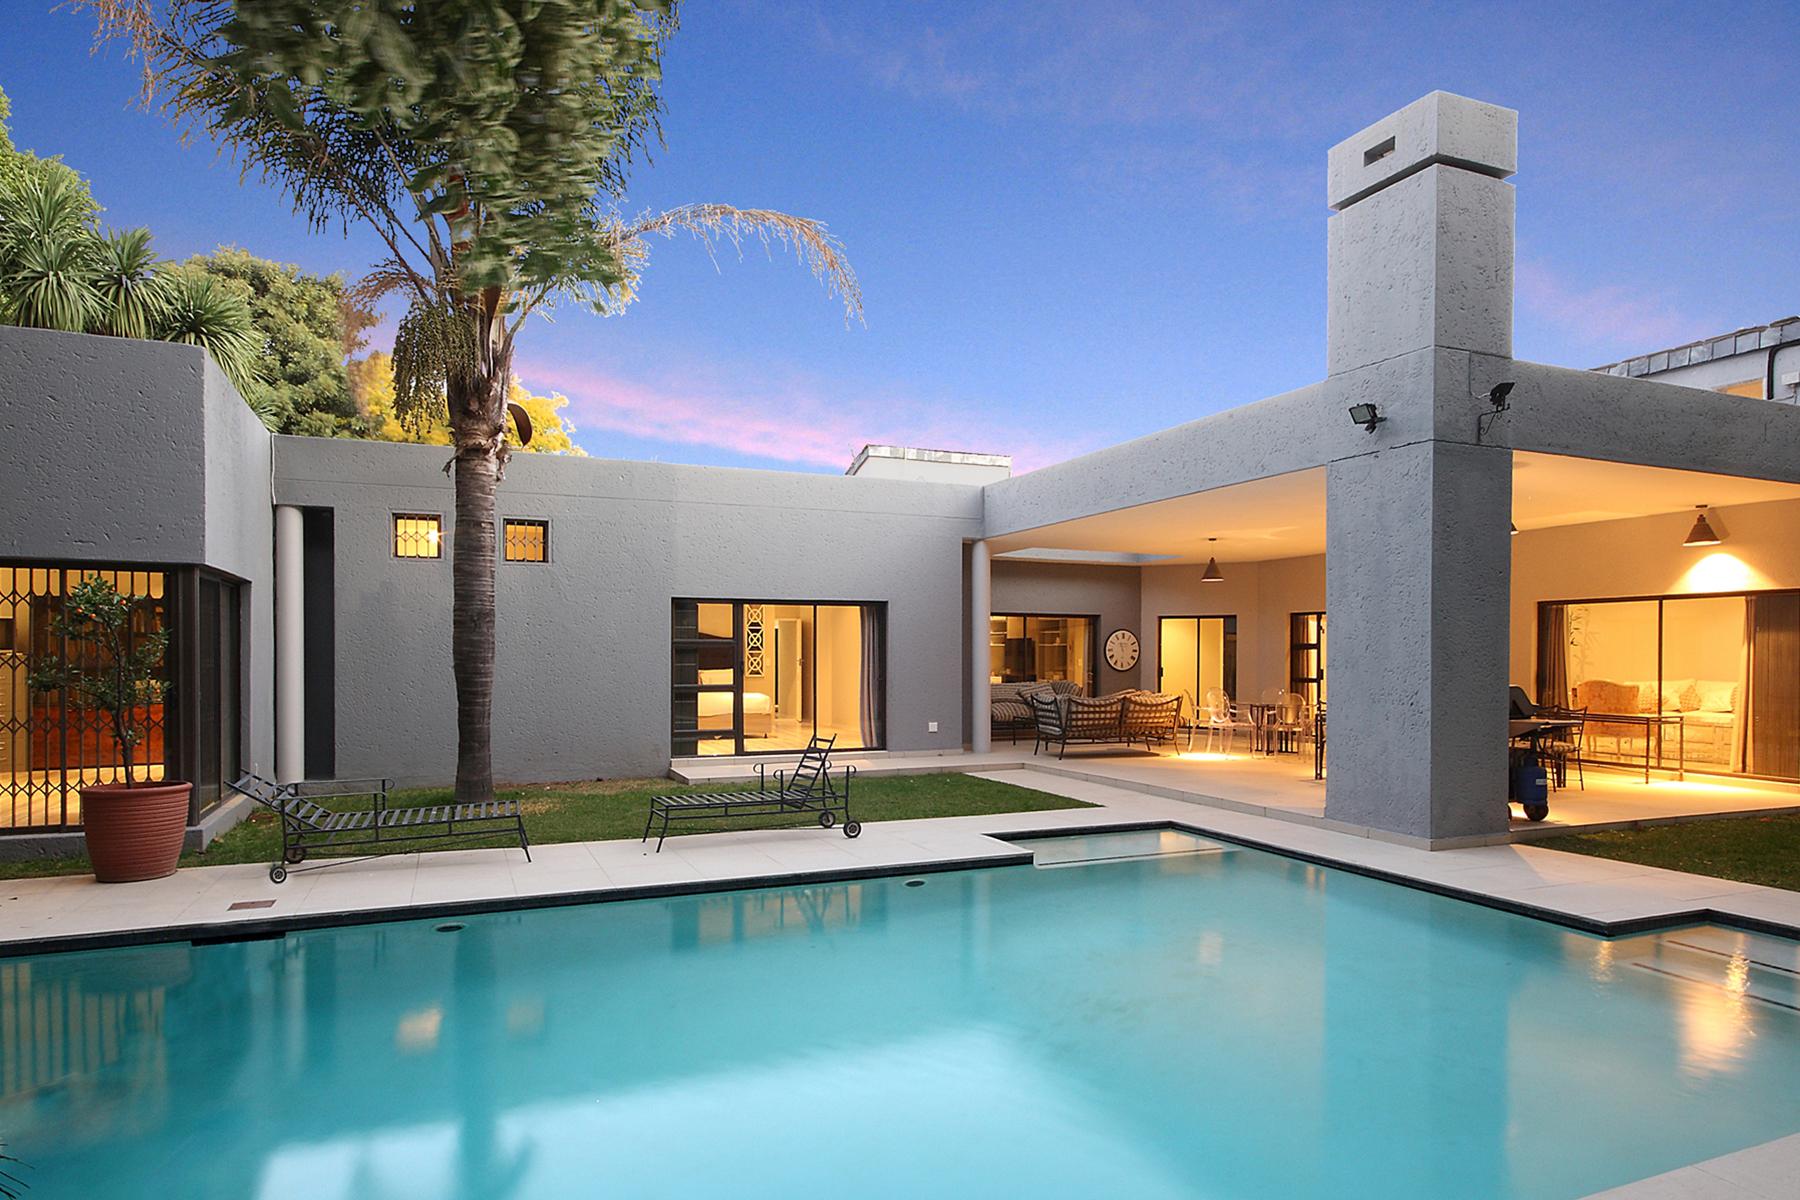 Moradia para Venda às Zandfontein Terrace Johannesburg, Gauteng 2057 África Do Sul